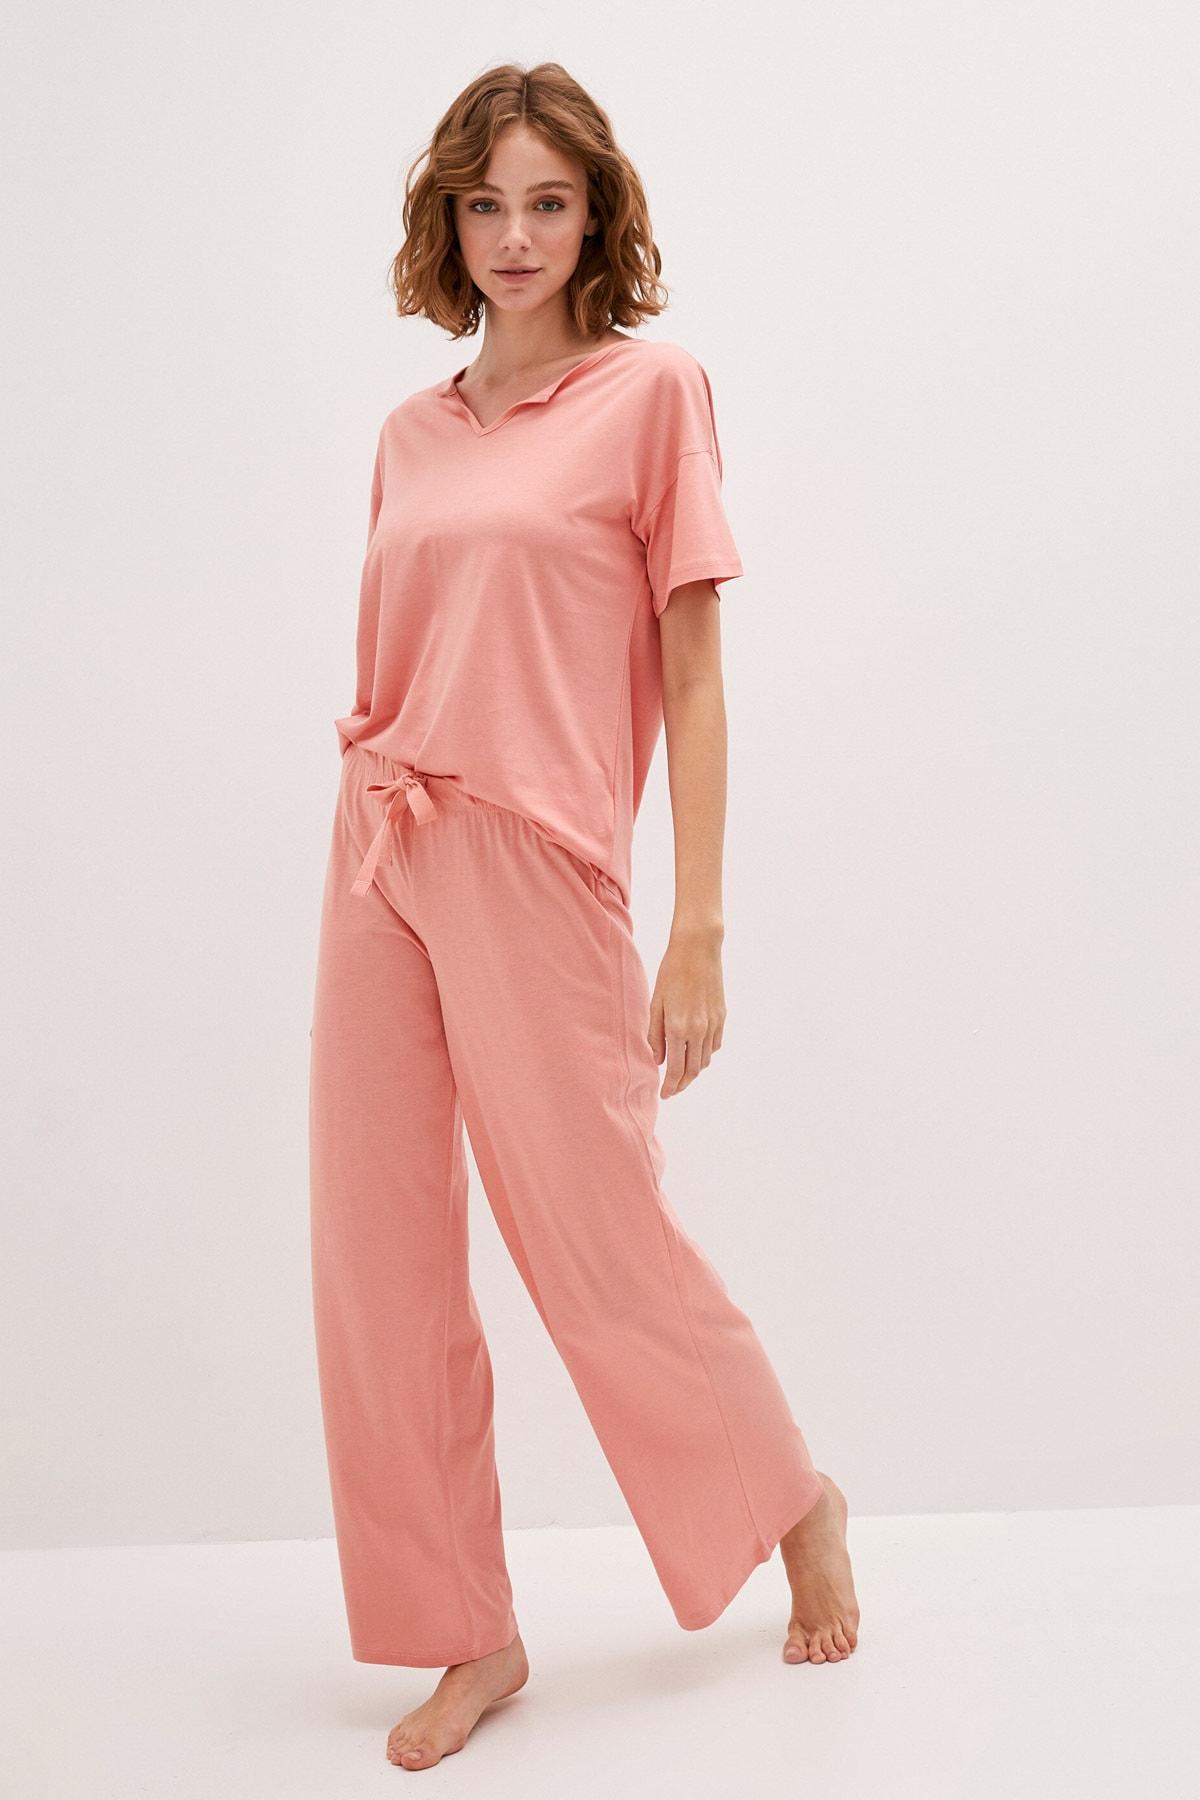 LC Waikiki Kadın Açık Mercan LCW DREAM Pijama Takım 1